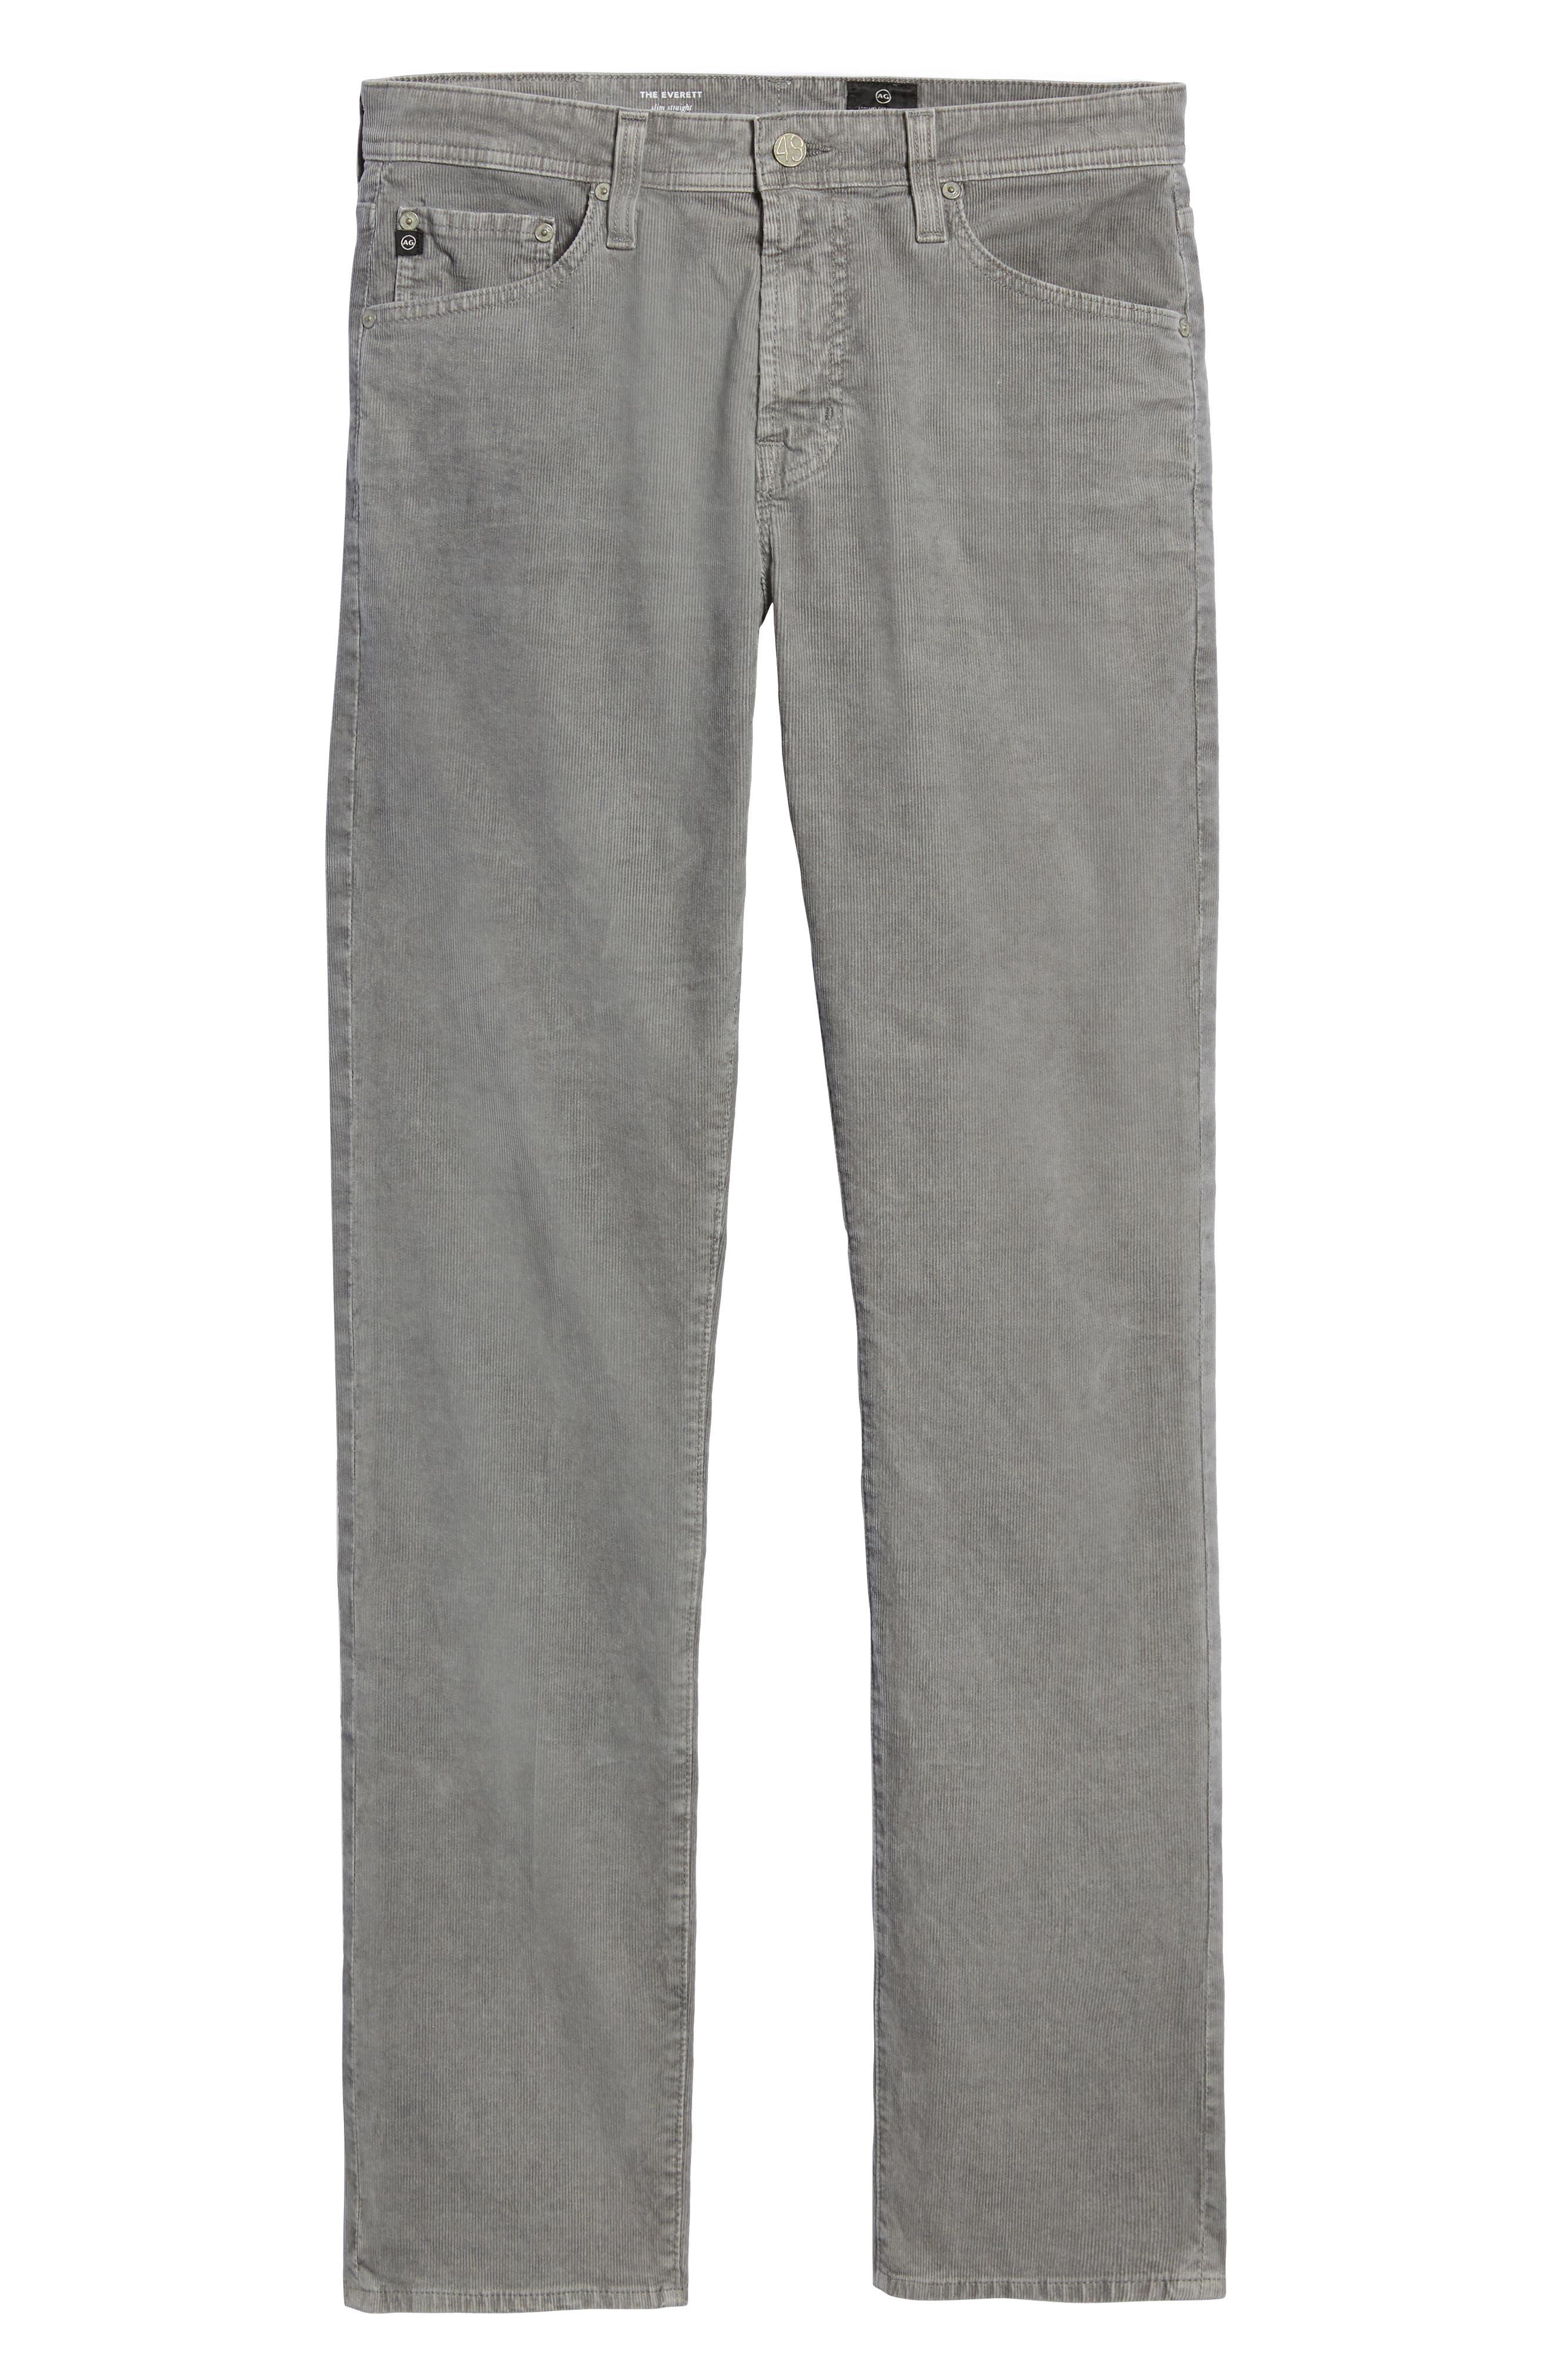 Everett Straight Leg Corduroy Pants,                             Alternate thumbnail 6, color,                             SULFUR AUTUMN FOG